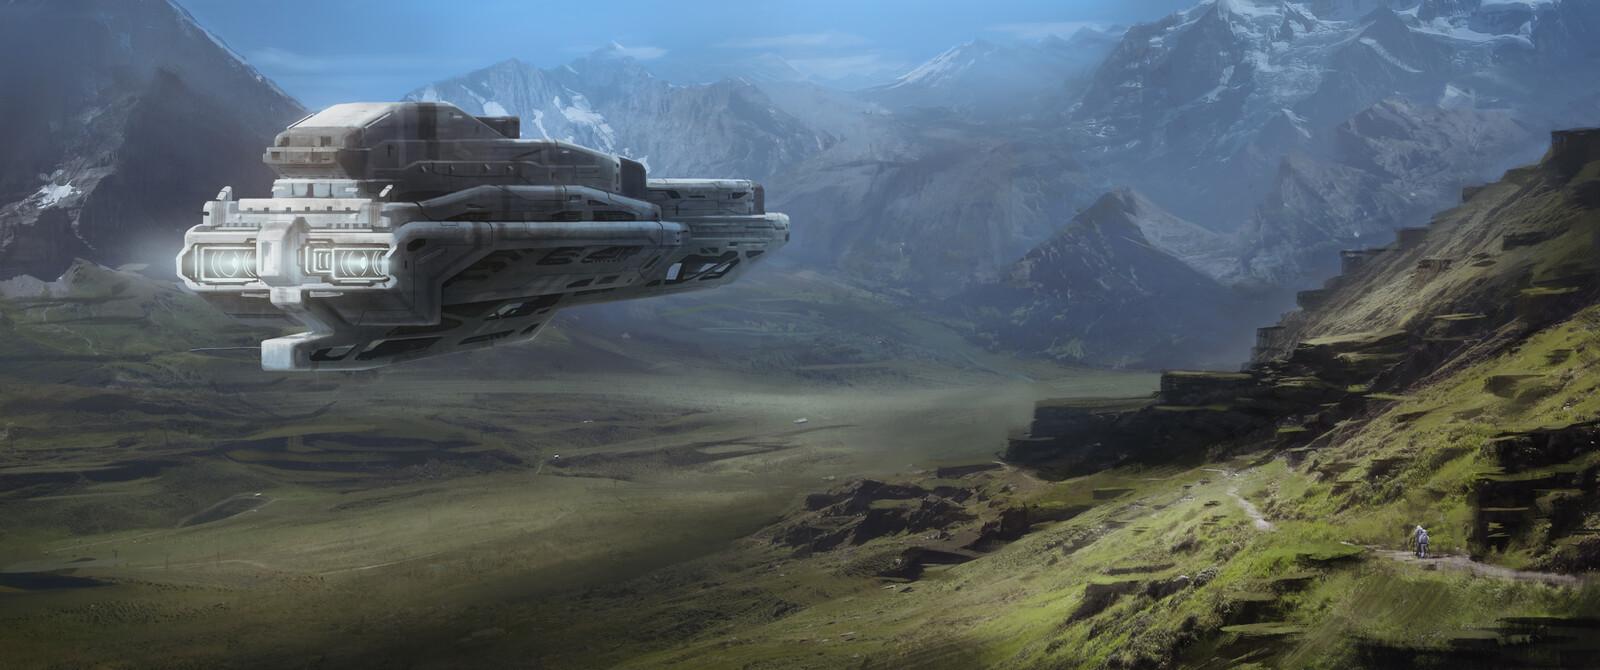 Spaceship Painting .3